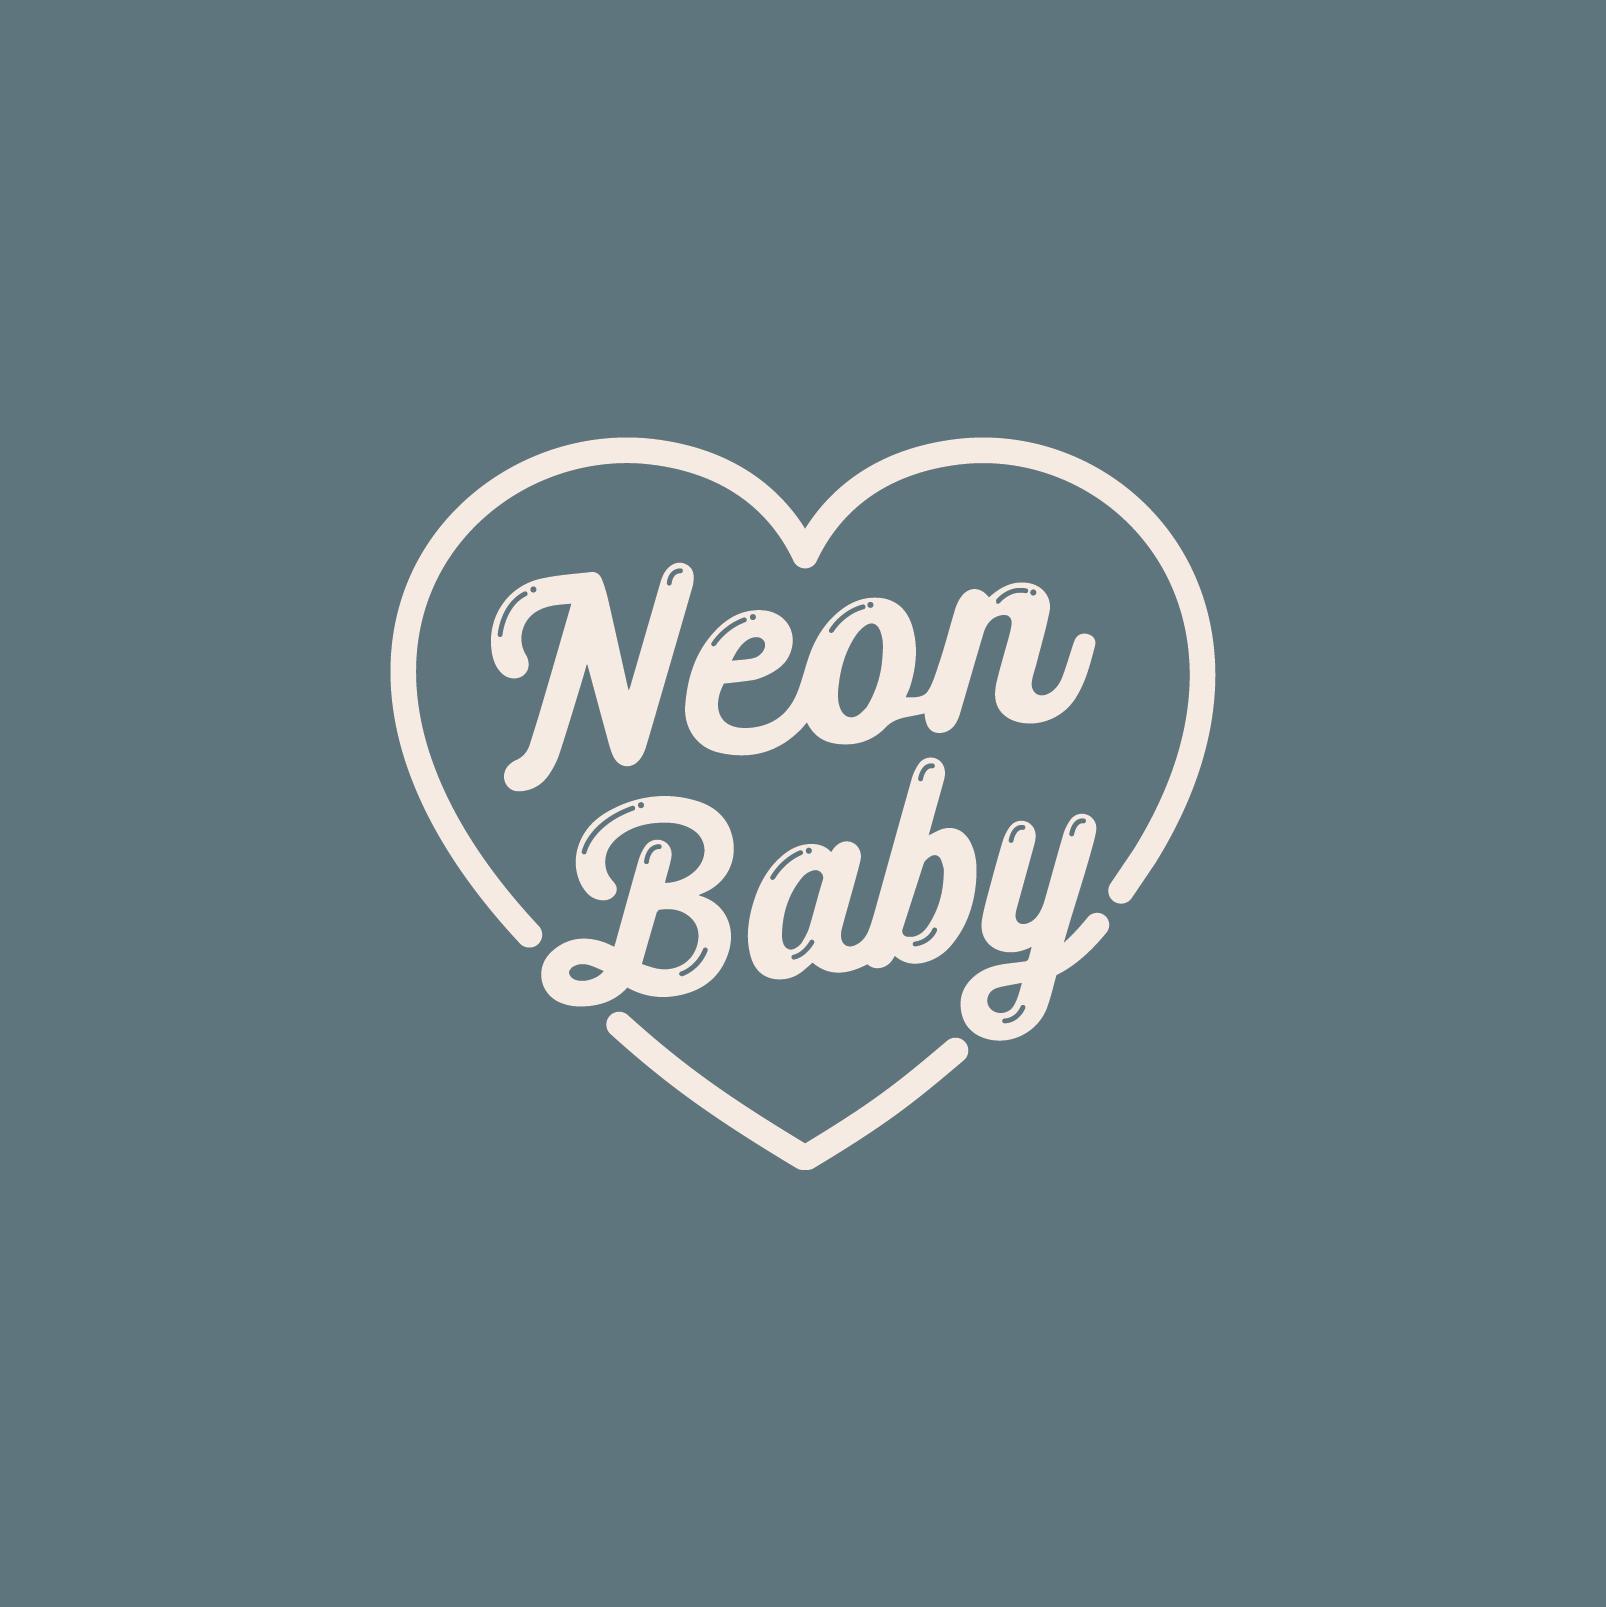 Neon Baby - Identity Design | Design & Branding